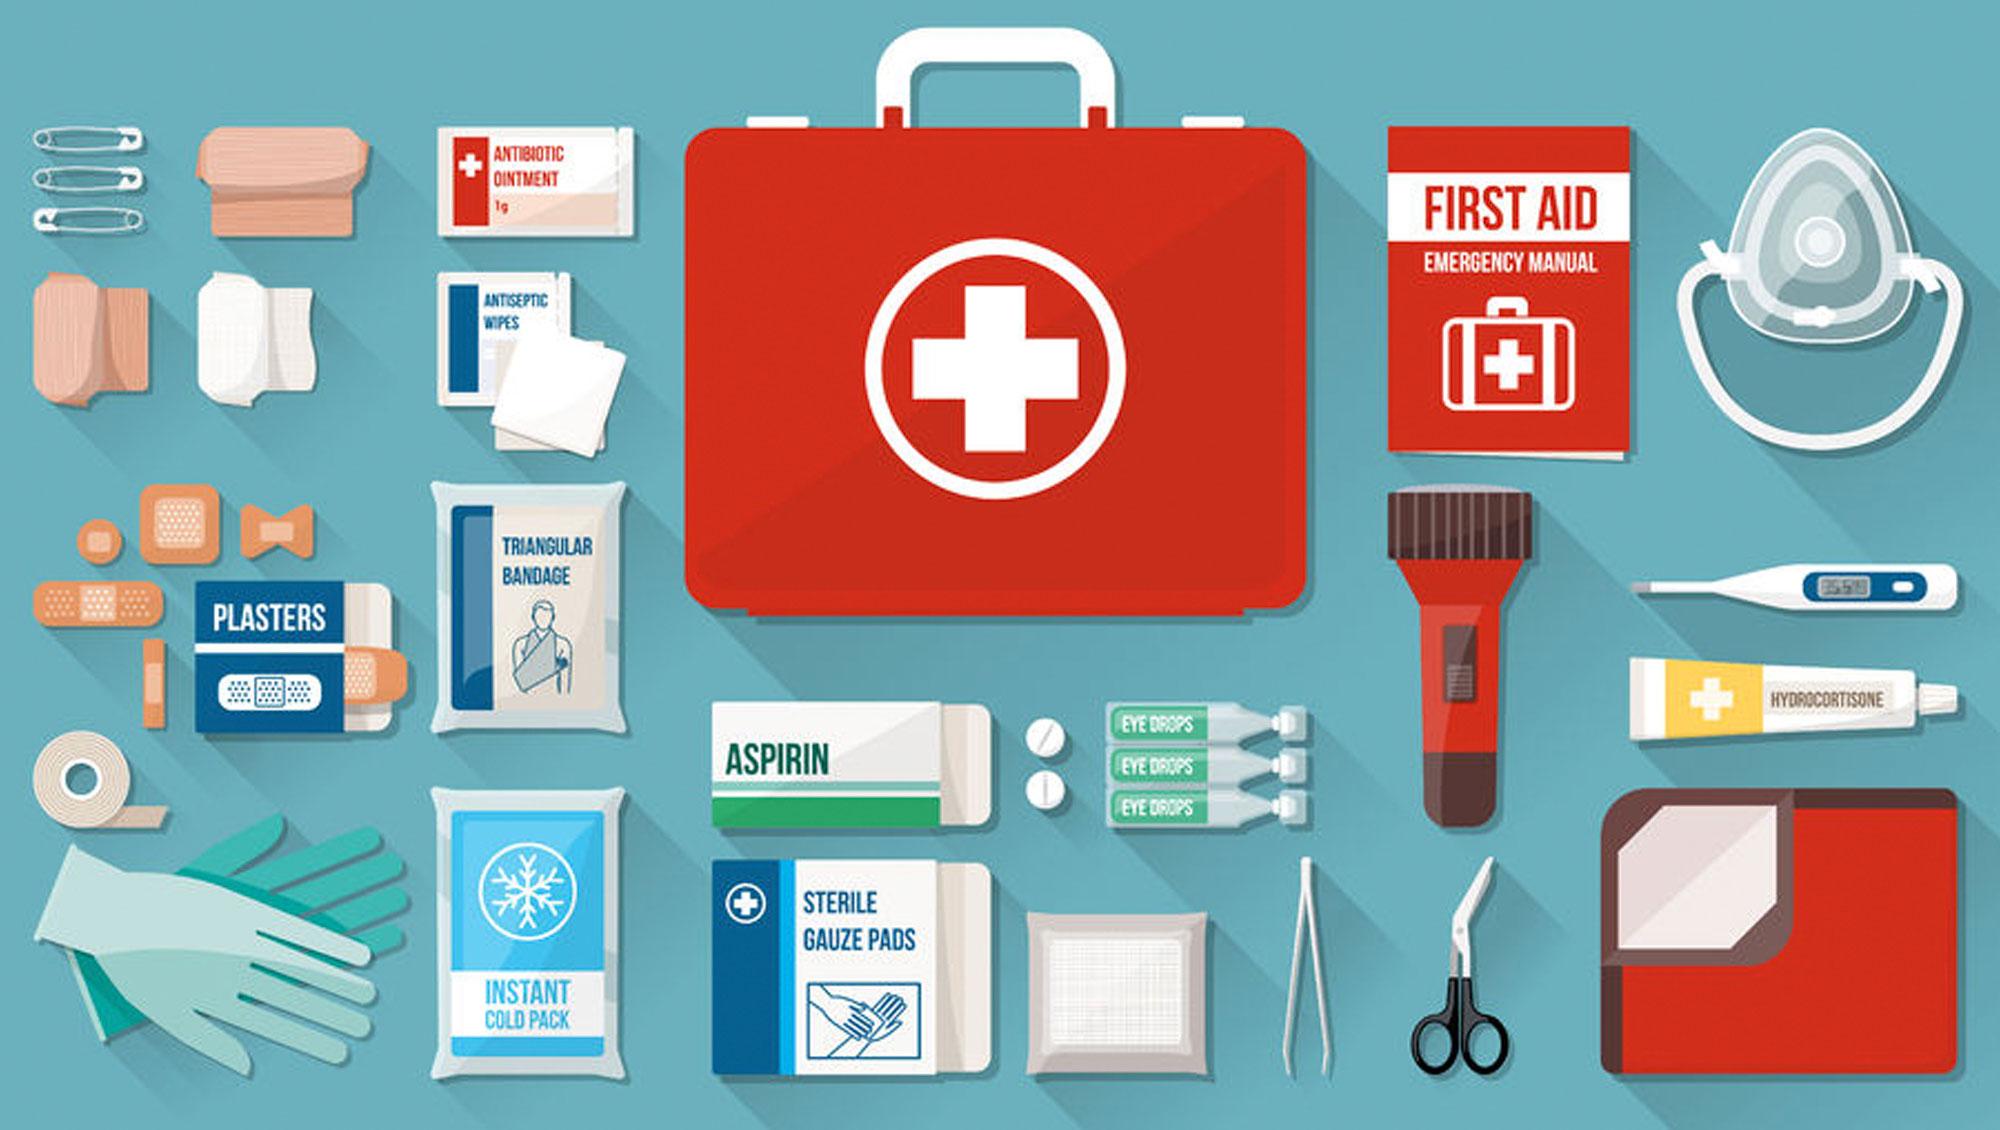 First Aid Treatments